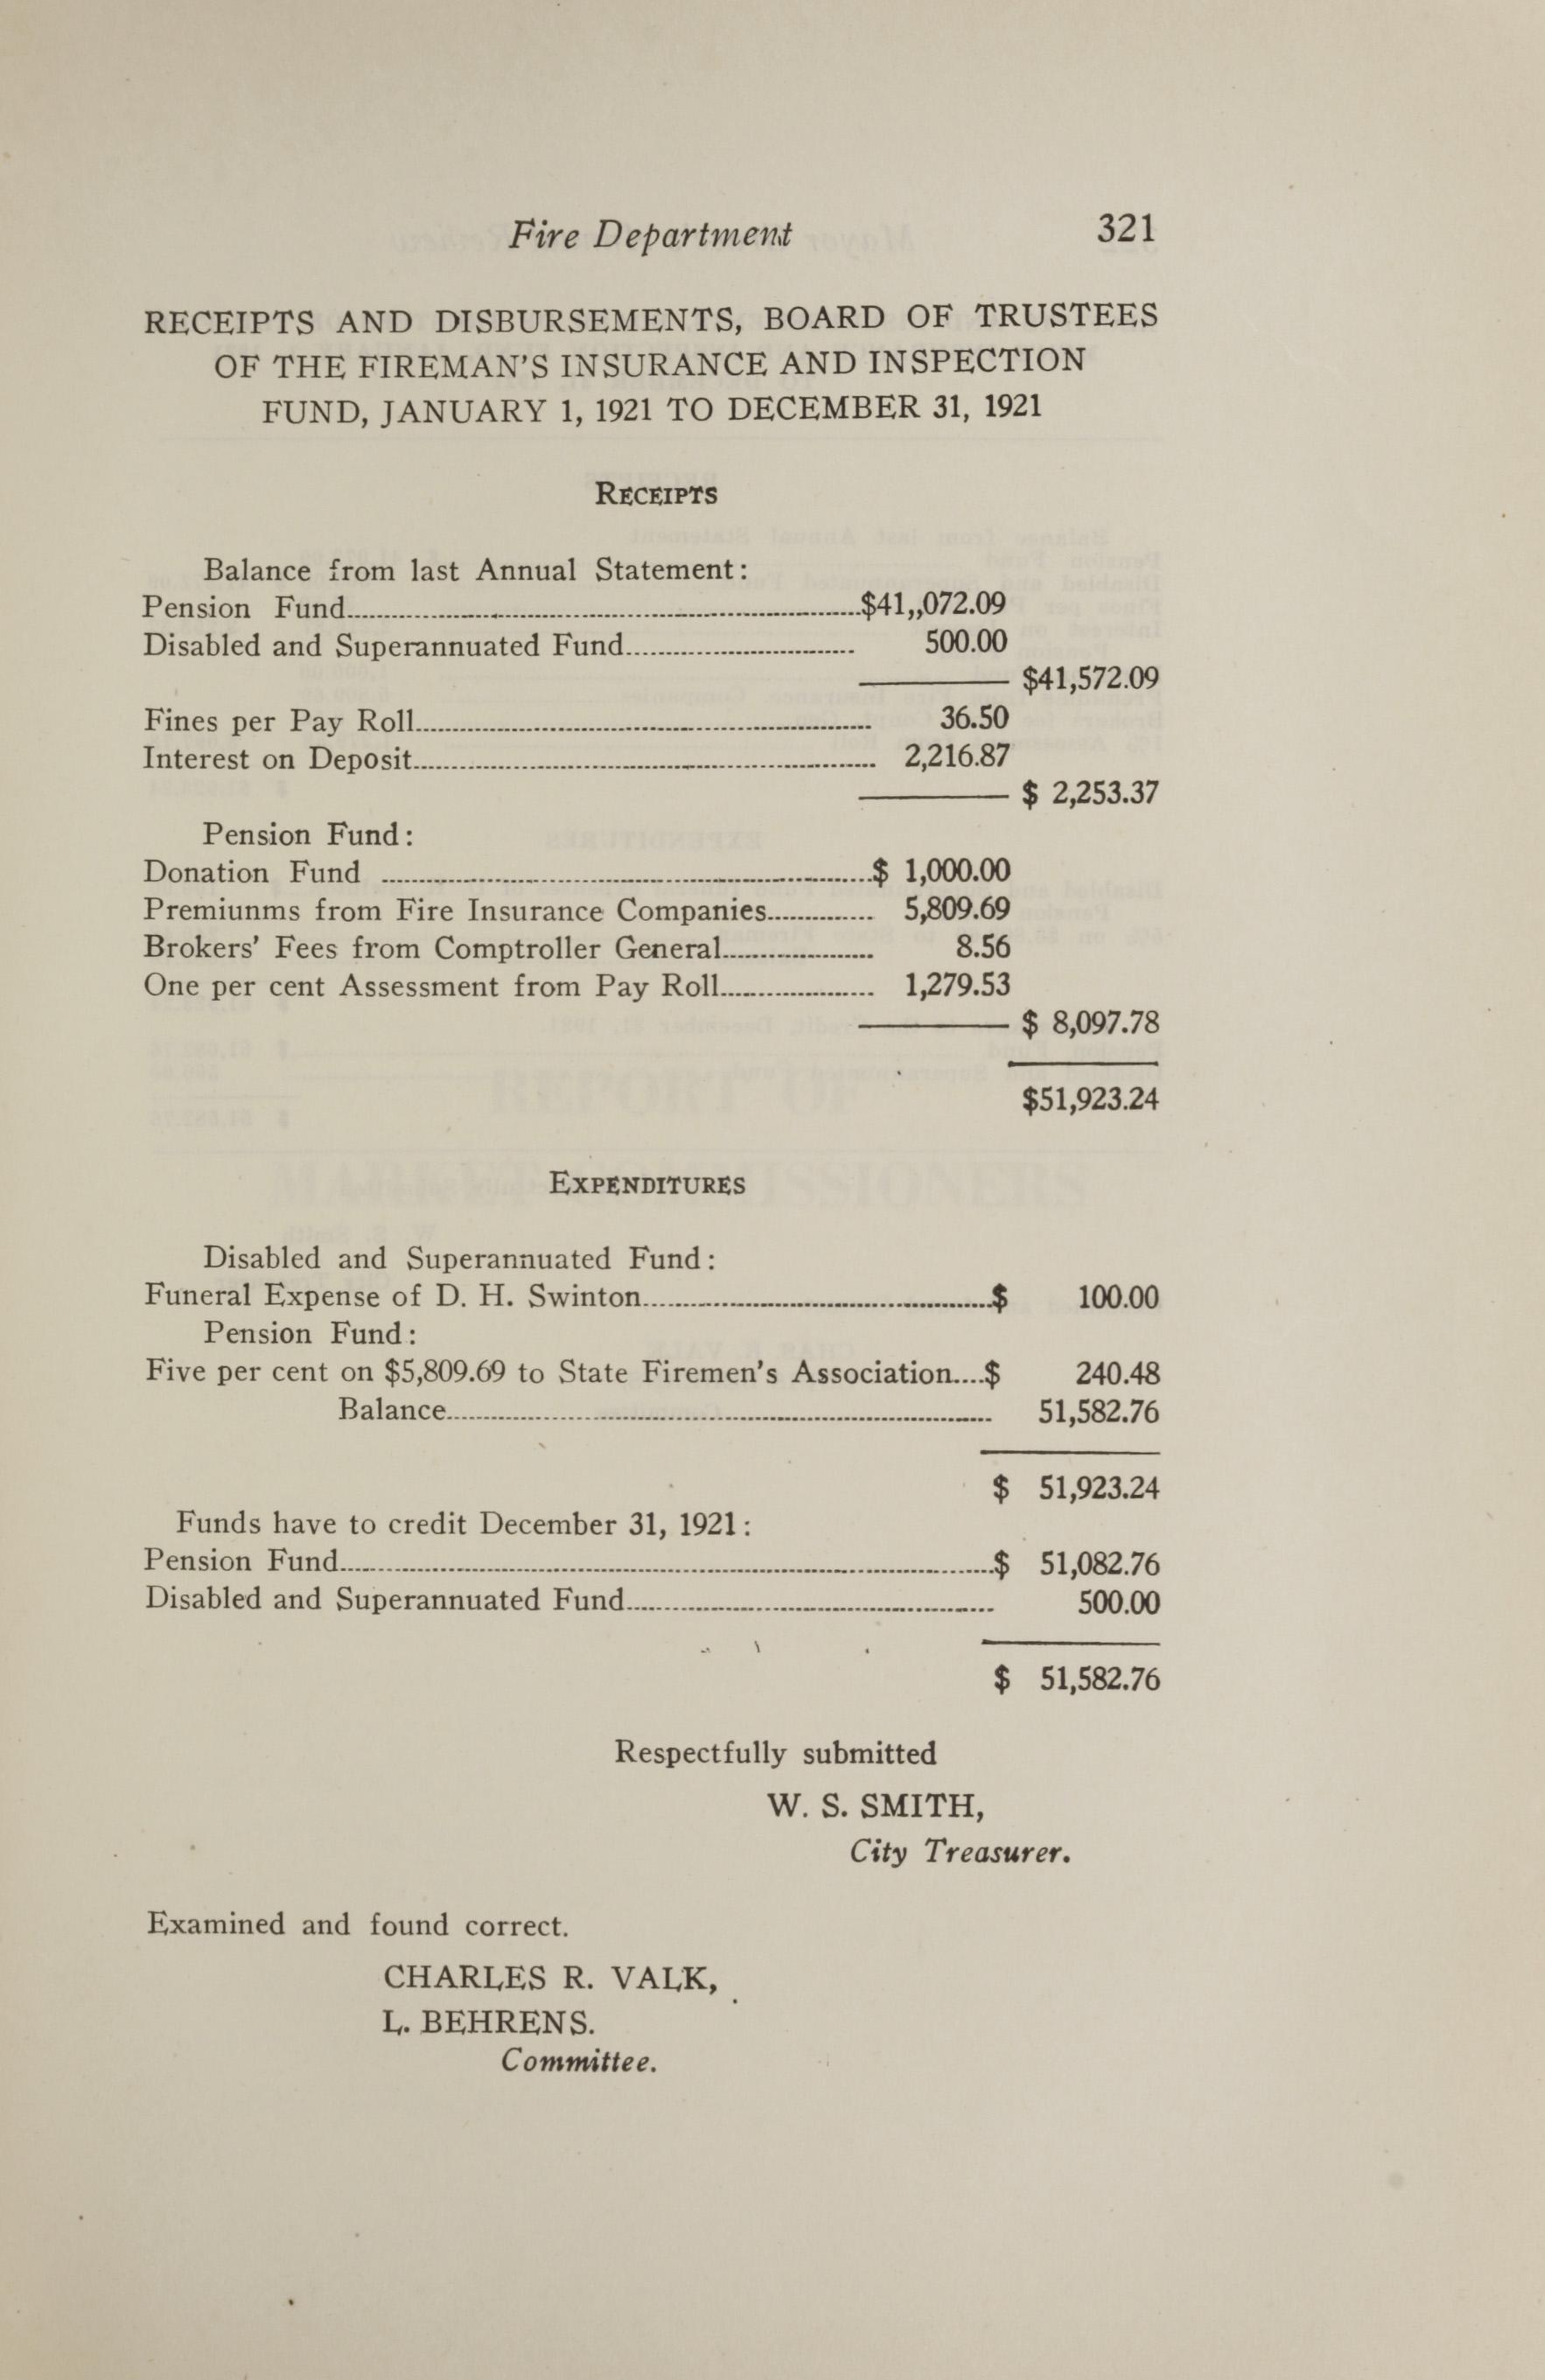 Charleston Yearbook, 1921, page 321